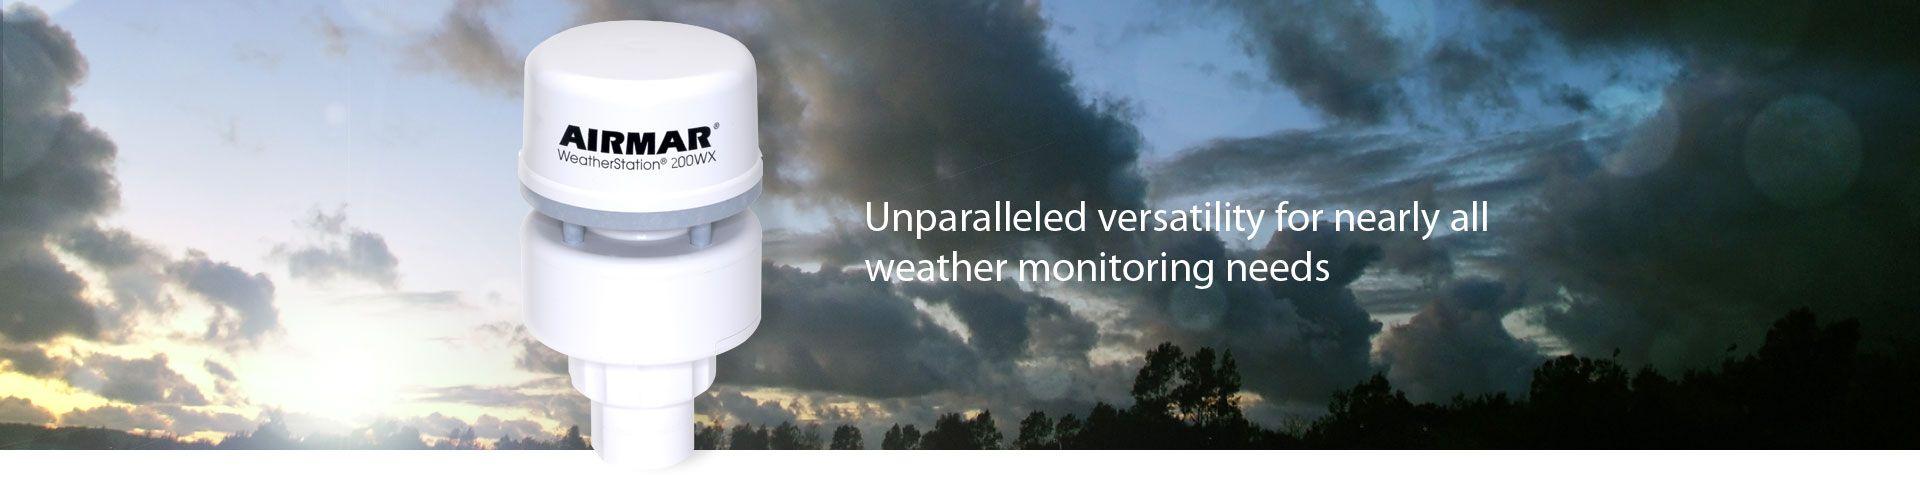 Airmar 200WX Ultrasonic WeatherStation Instrument